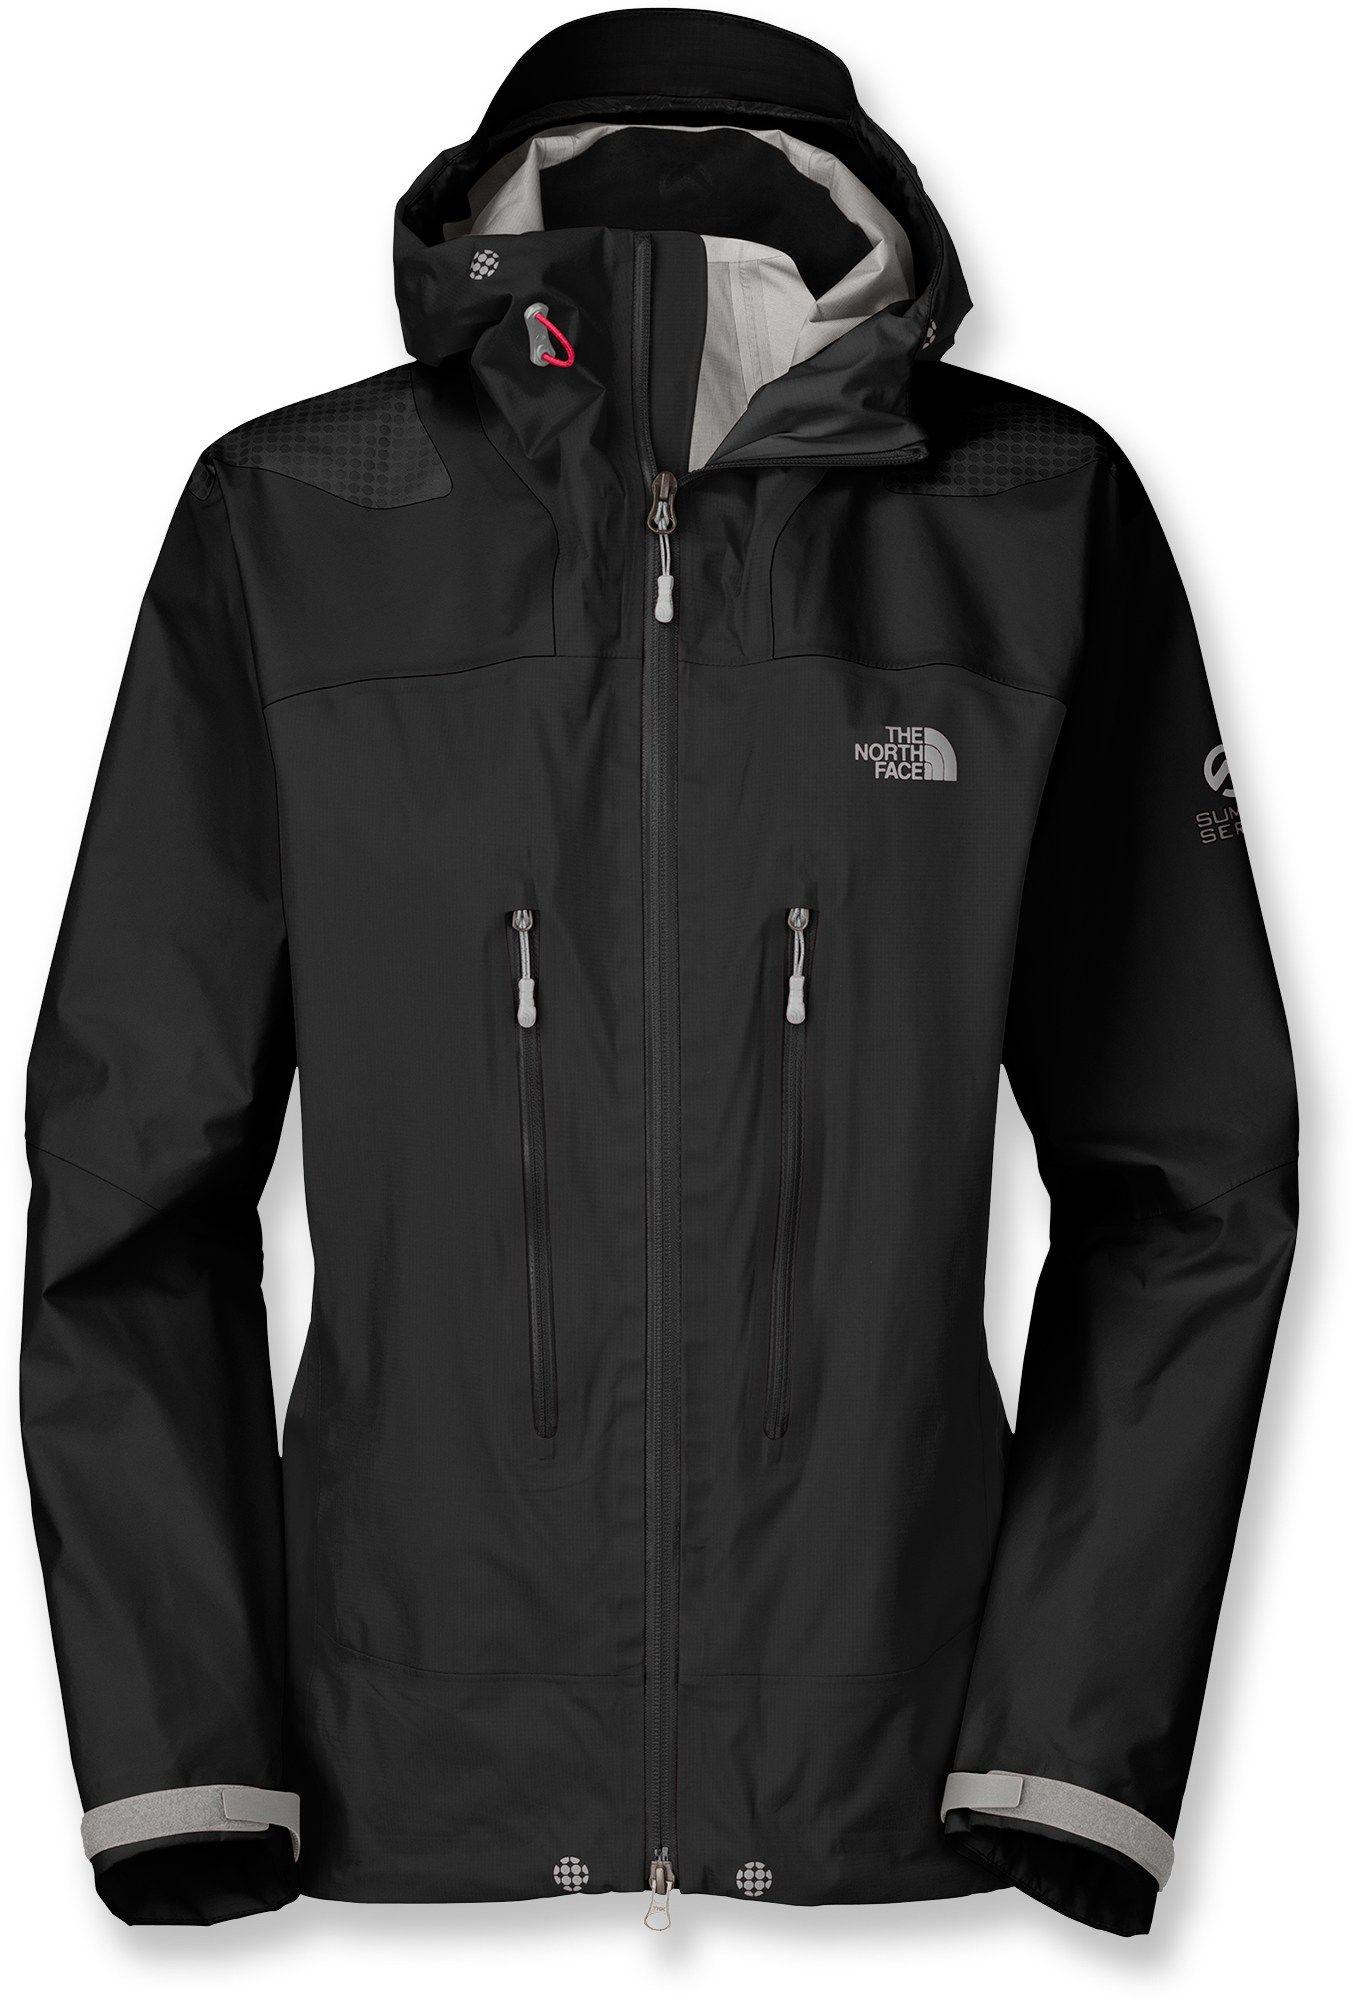 The North Face Meru Gore Jacket Women S Free Shipping At Rei Com Jackets North Face Women Jackets For Women [ 2000 x 1353 Pixel ]